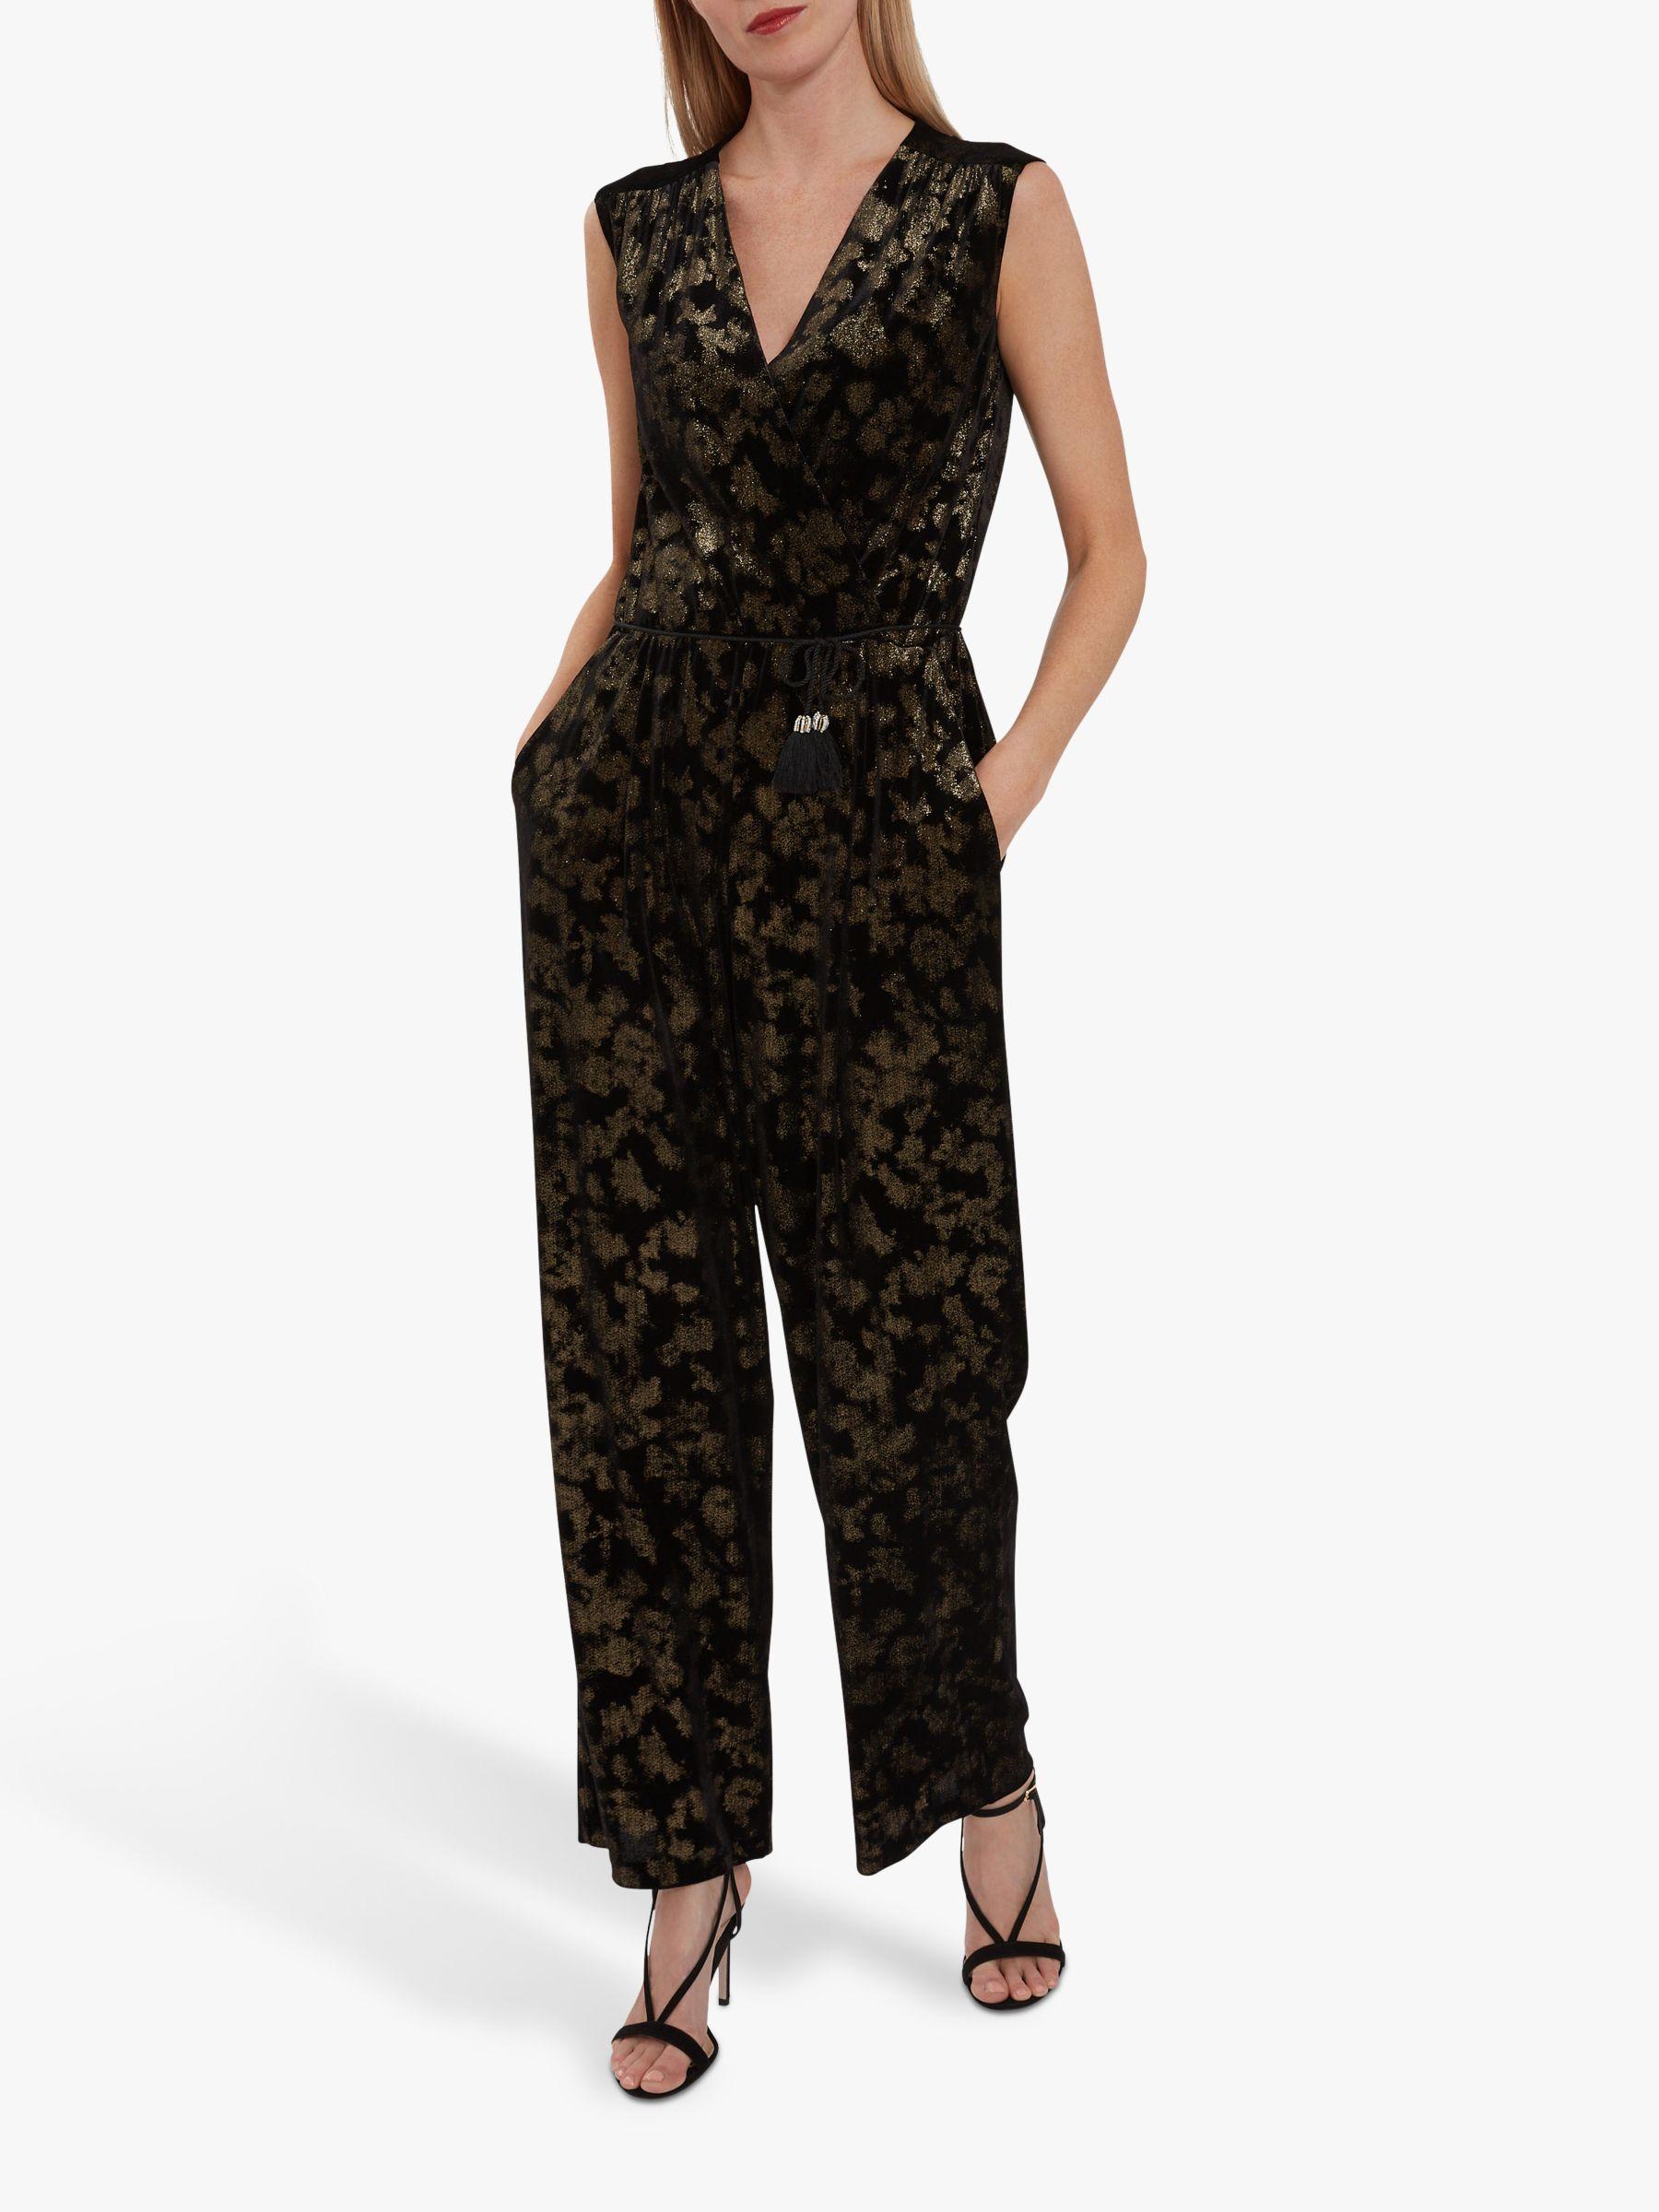 Gina Bacconi Elzina Velvet Jumpsuit Black Gold At John Lewis Partners